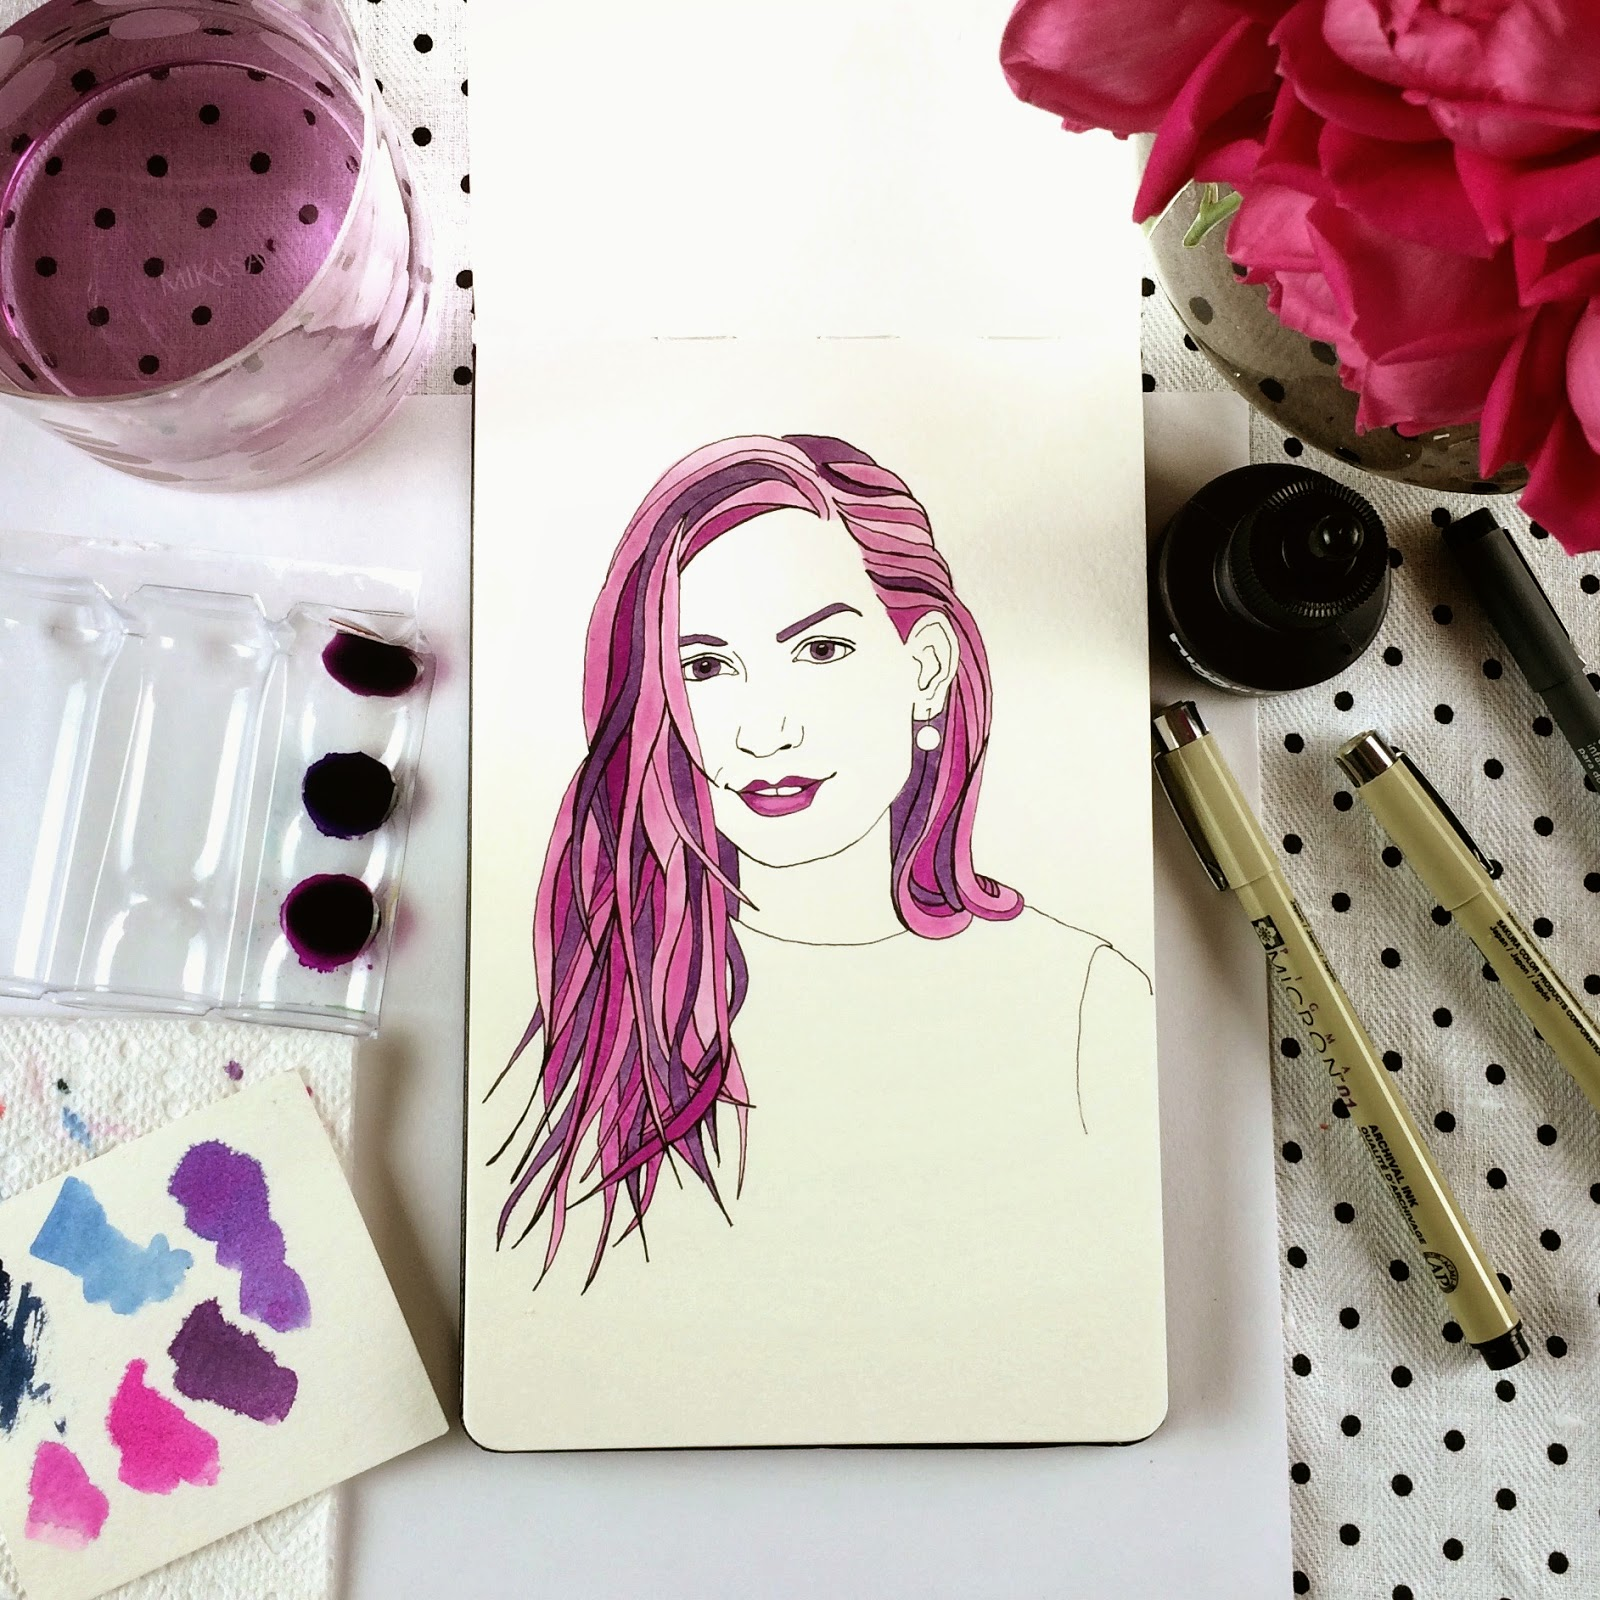 Inktober fashion illustration of Katie Rodgers of PaperFashion by Jessica Mack aka BrownPaperBunny